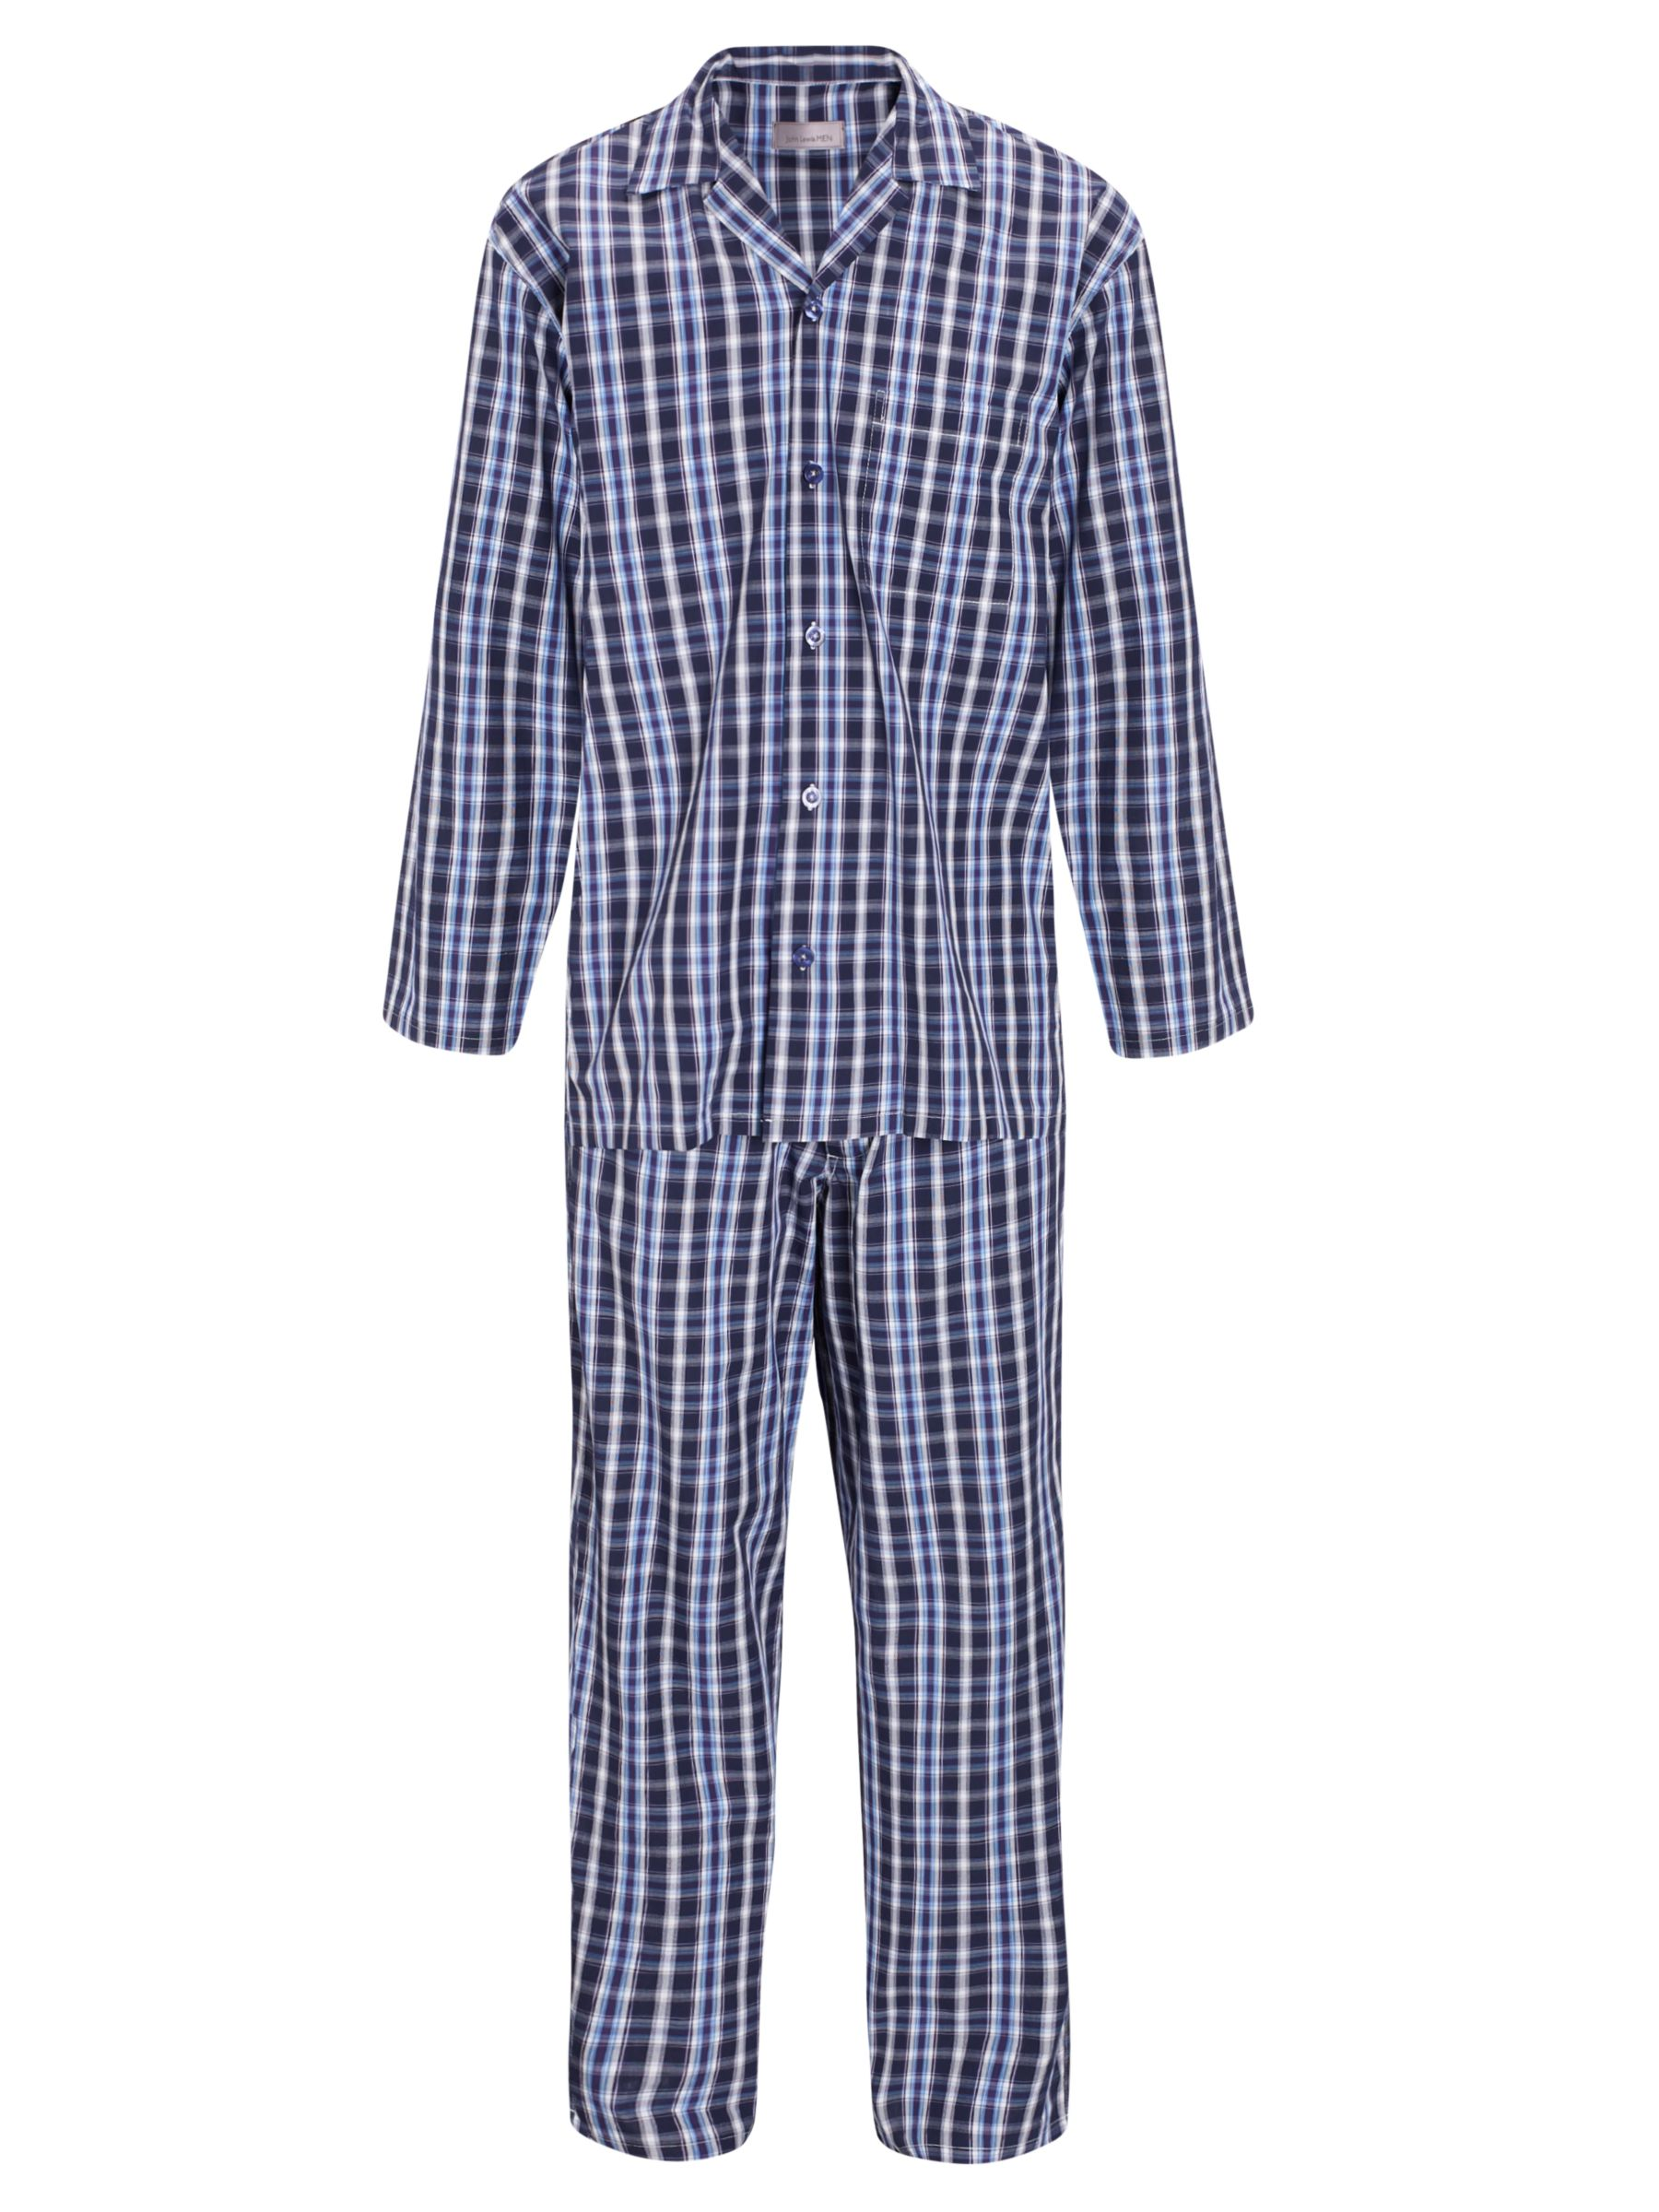 John Lewis Hazel Woven Cotton Check Pyjamas, Navy/Purple